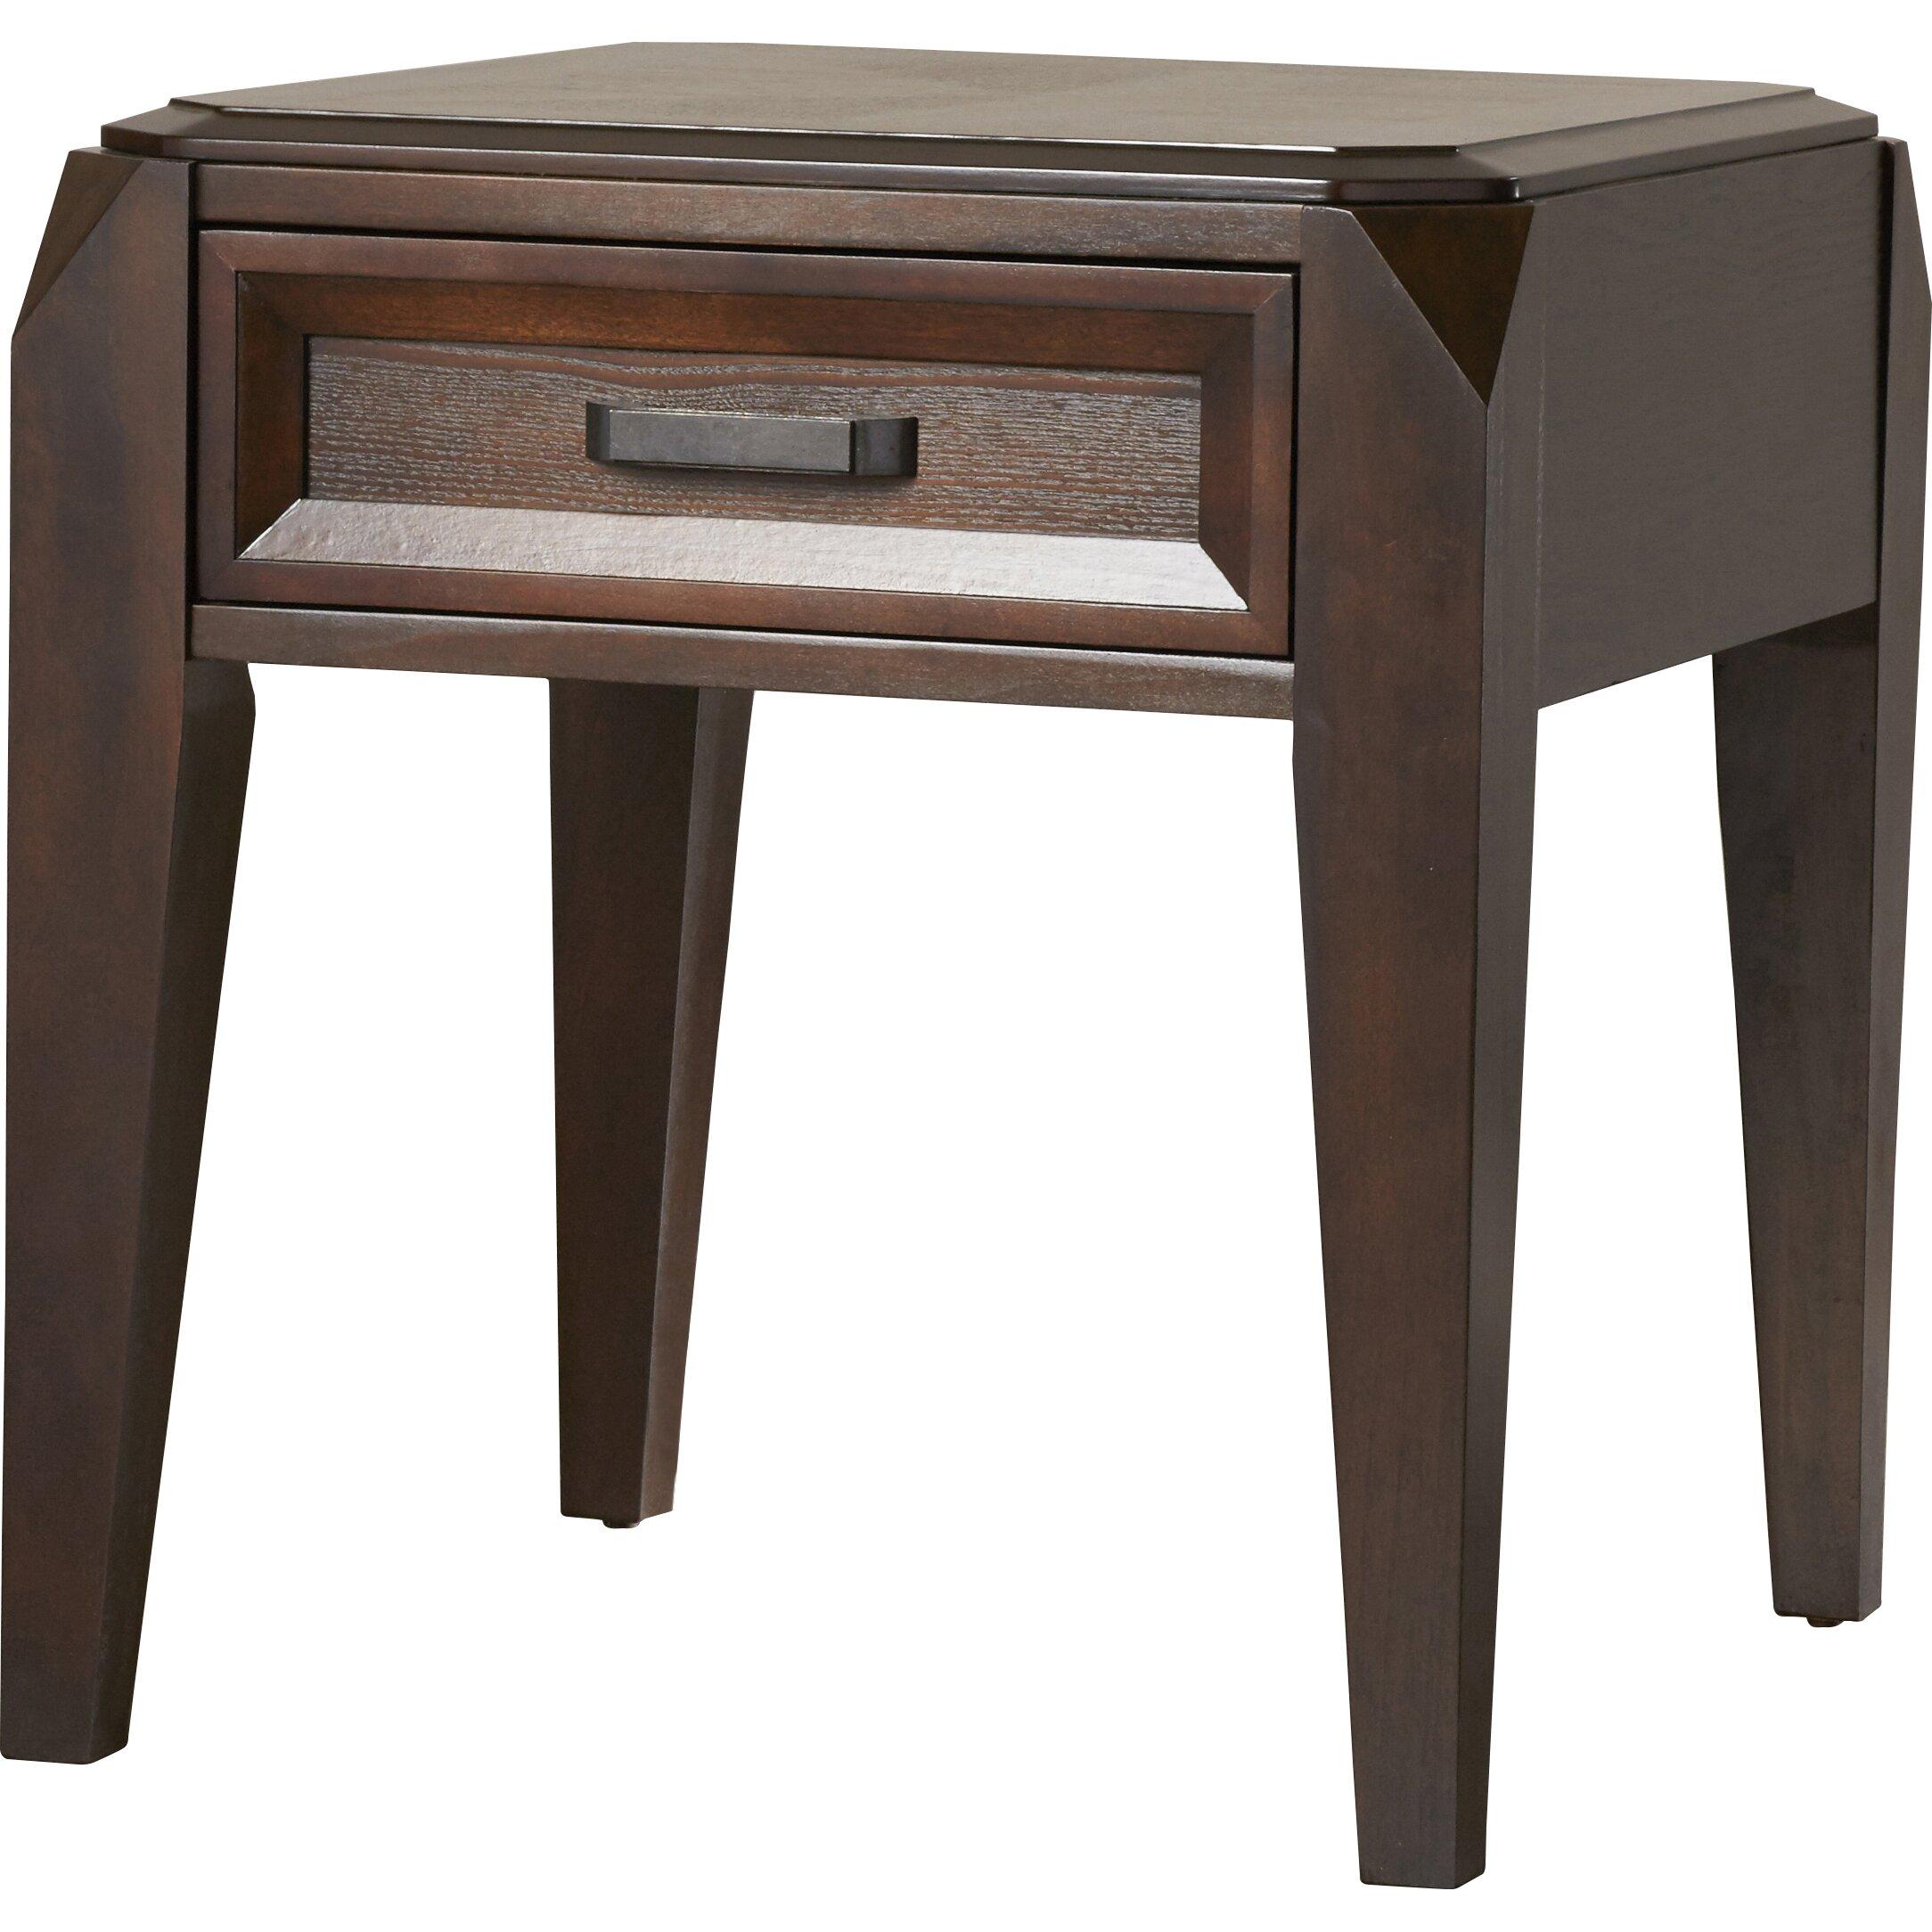 Steve silver furniture wellington end table reviews for Furniture wellington